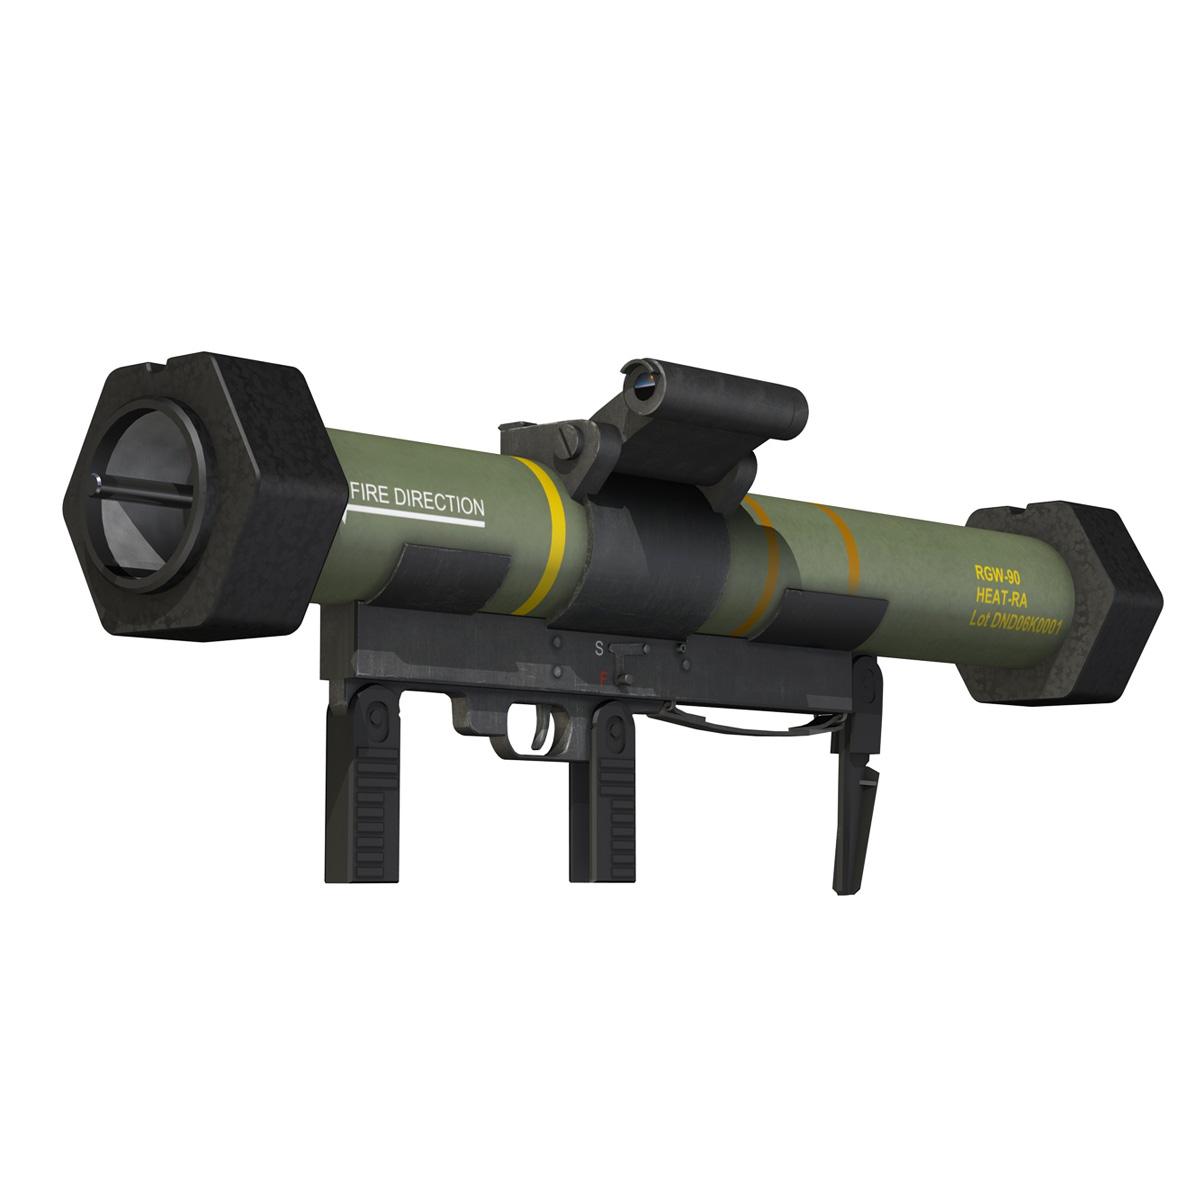 anti-armor launcher matador 3d model 3ds fbx c4d lwo obj 197070